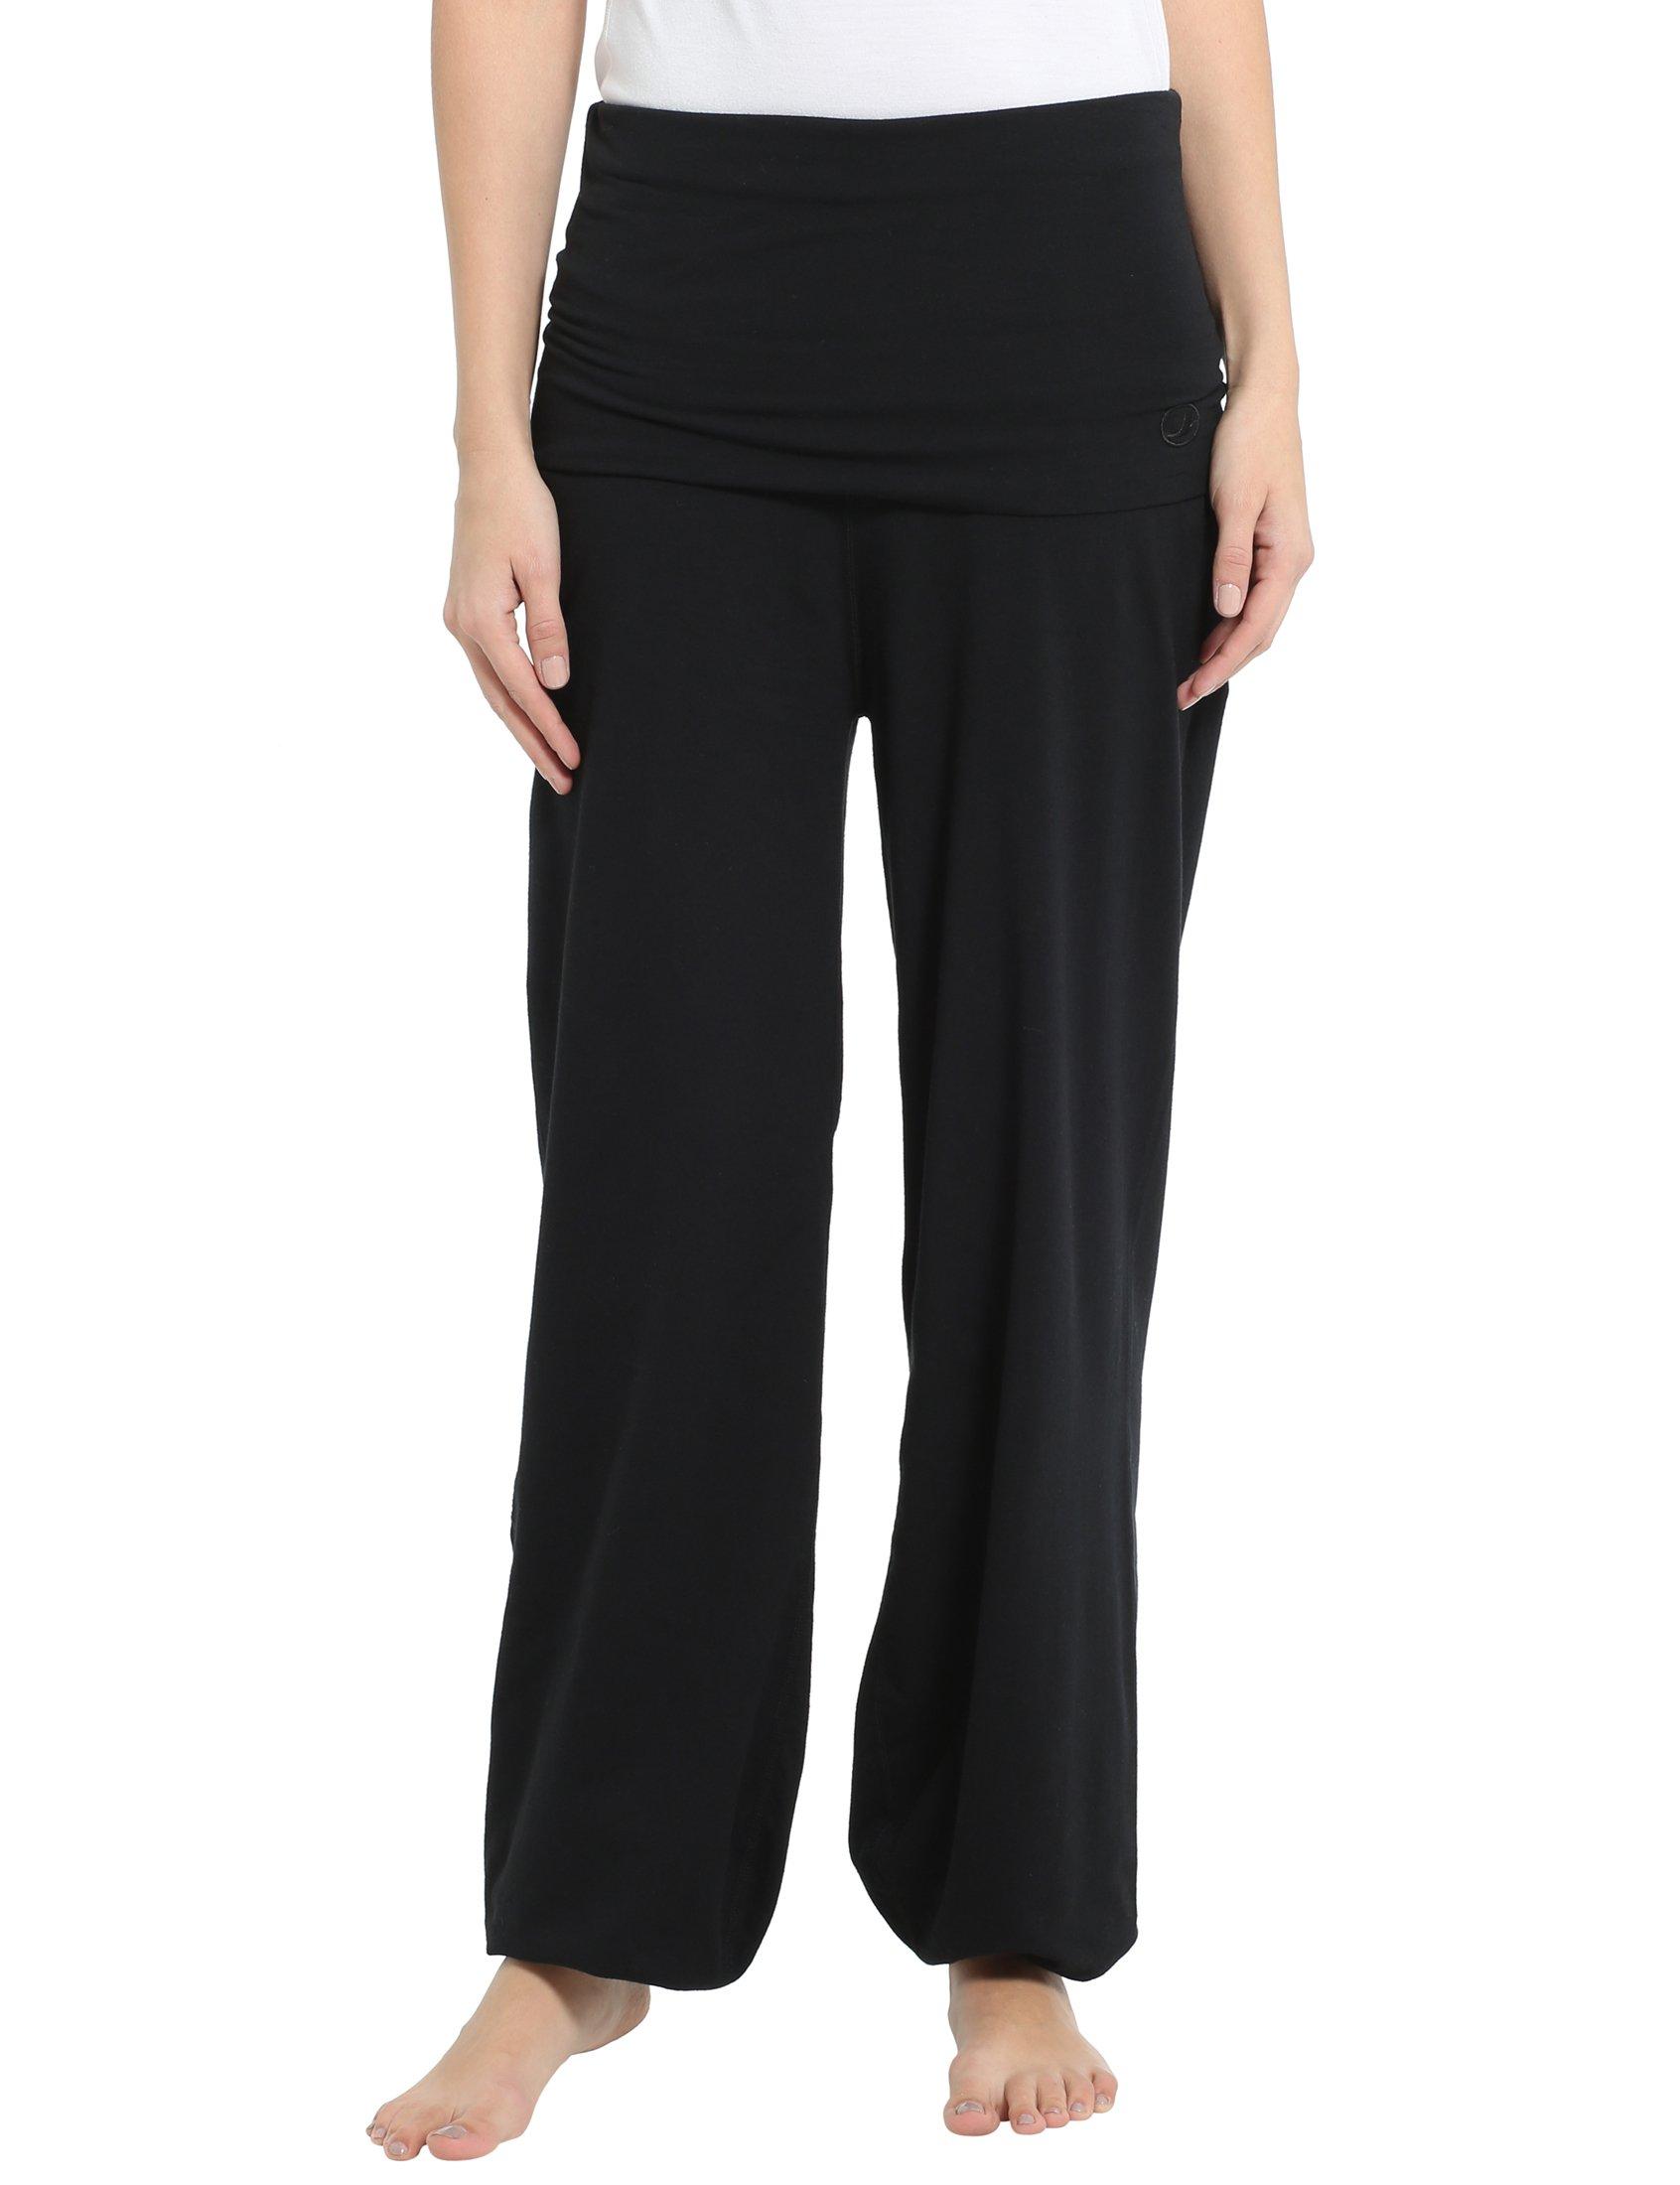 Ultrasport Pantalones de Yoga para Mujer Balance - Pantalones Harem de Mujer  con Puños de Canalé - Pantalones Bombachos Mujer Holgados Estilo Tailandés f5ec47e1e5d